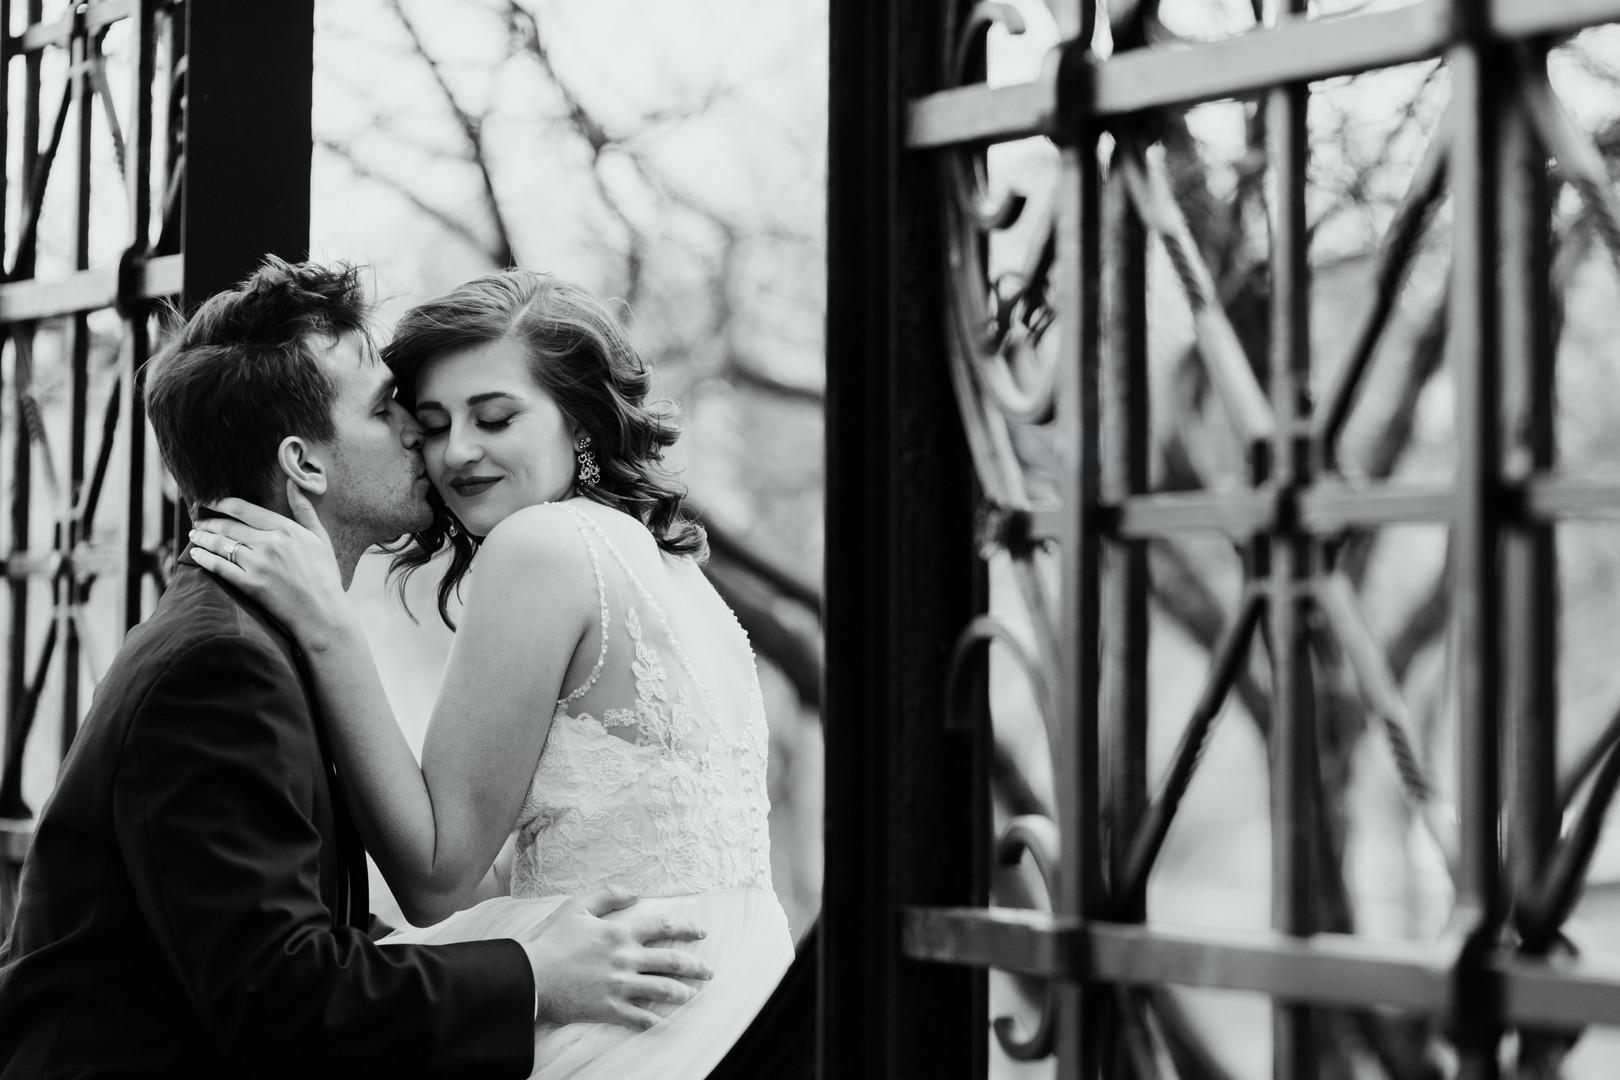 Romantic Bride and Groom Portrait Chicago Wedding Stephanie Wood Photography